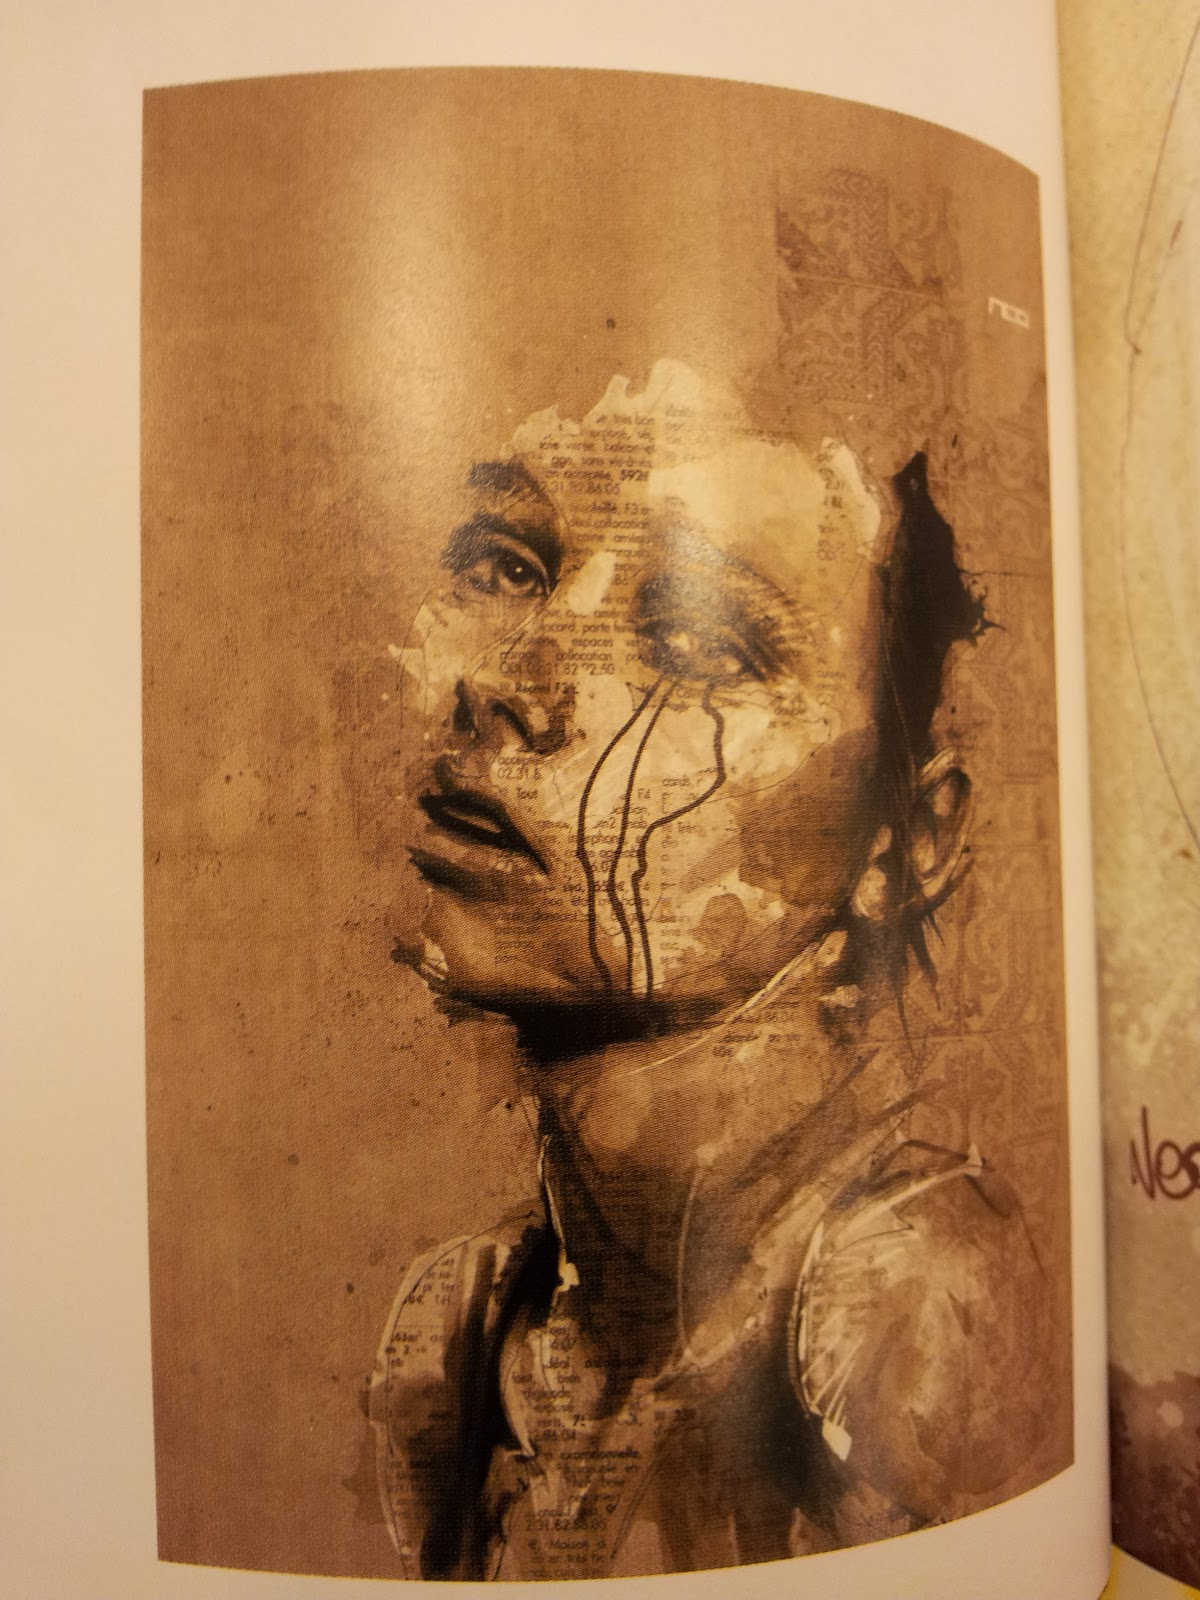 Mandy JW, Art and Design: PERSONAL WORK   Drafts: Sugar Skull